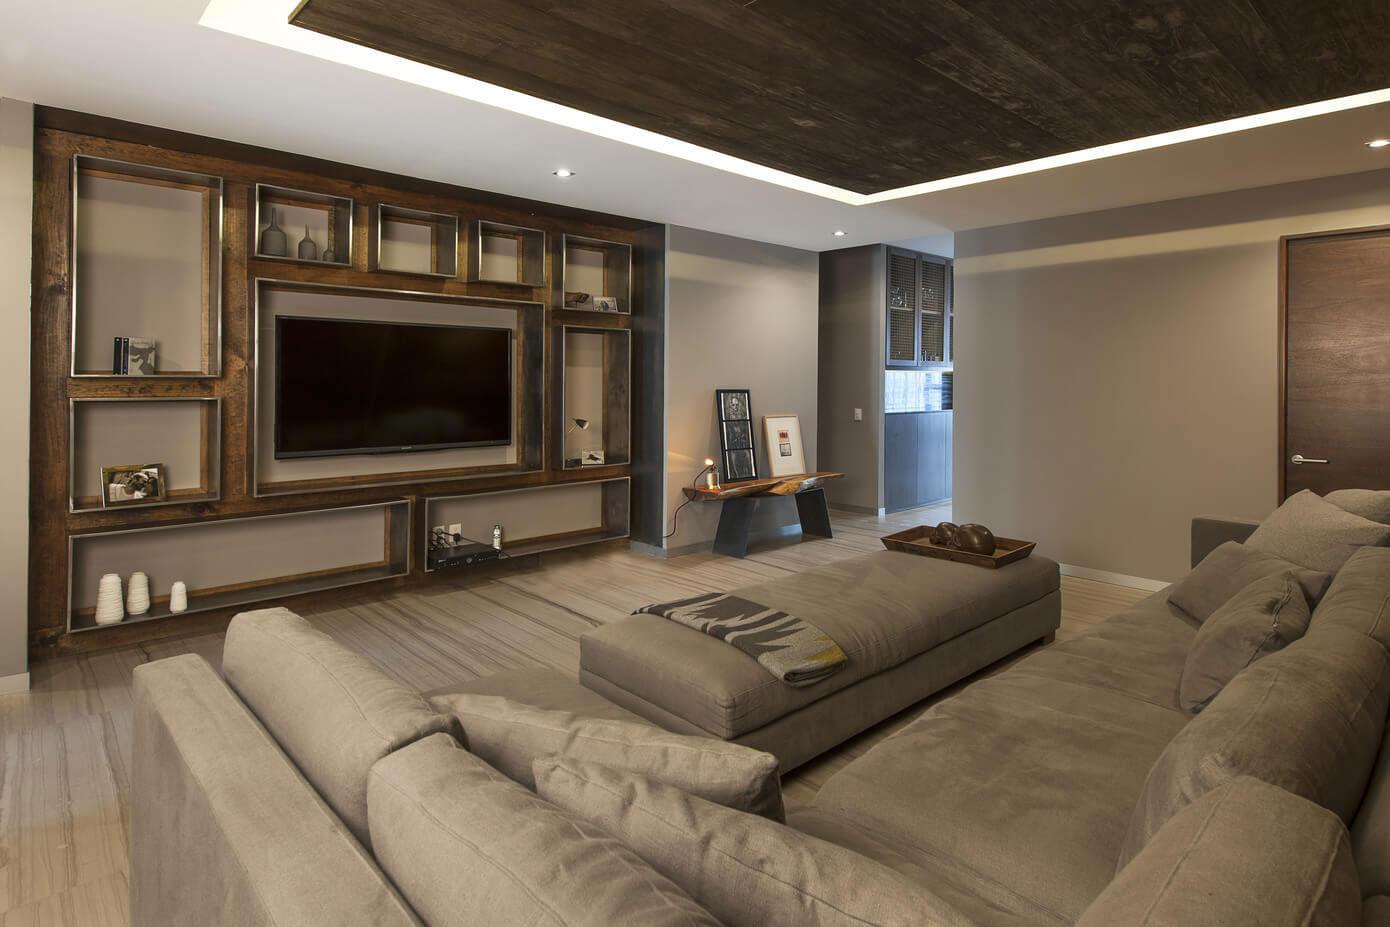 Contemporary CM Apartment in Mexico City by Kababie Arquitectos-03